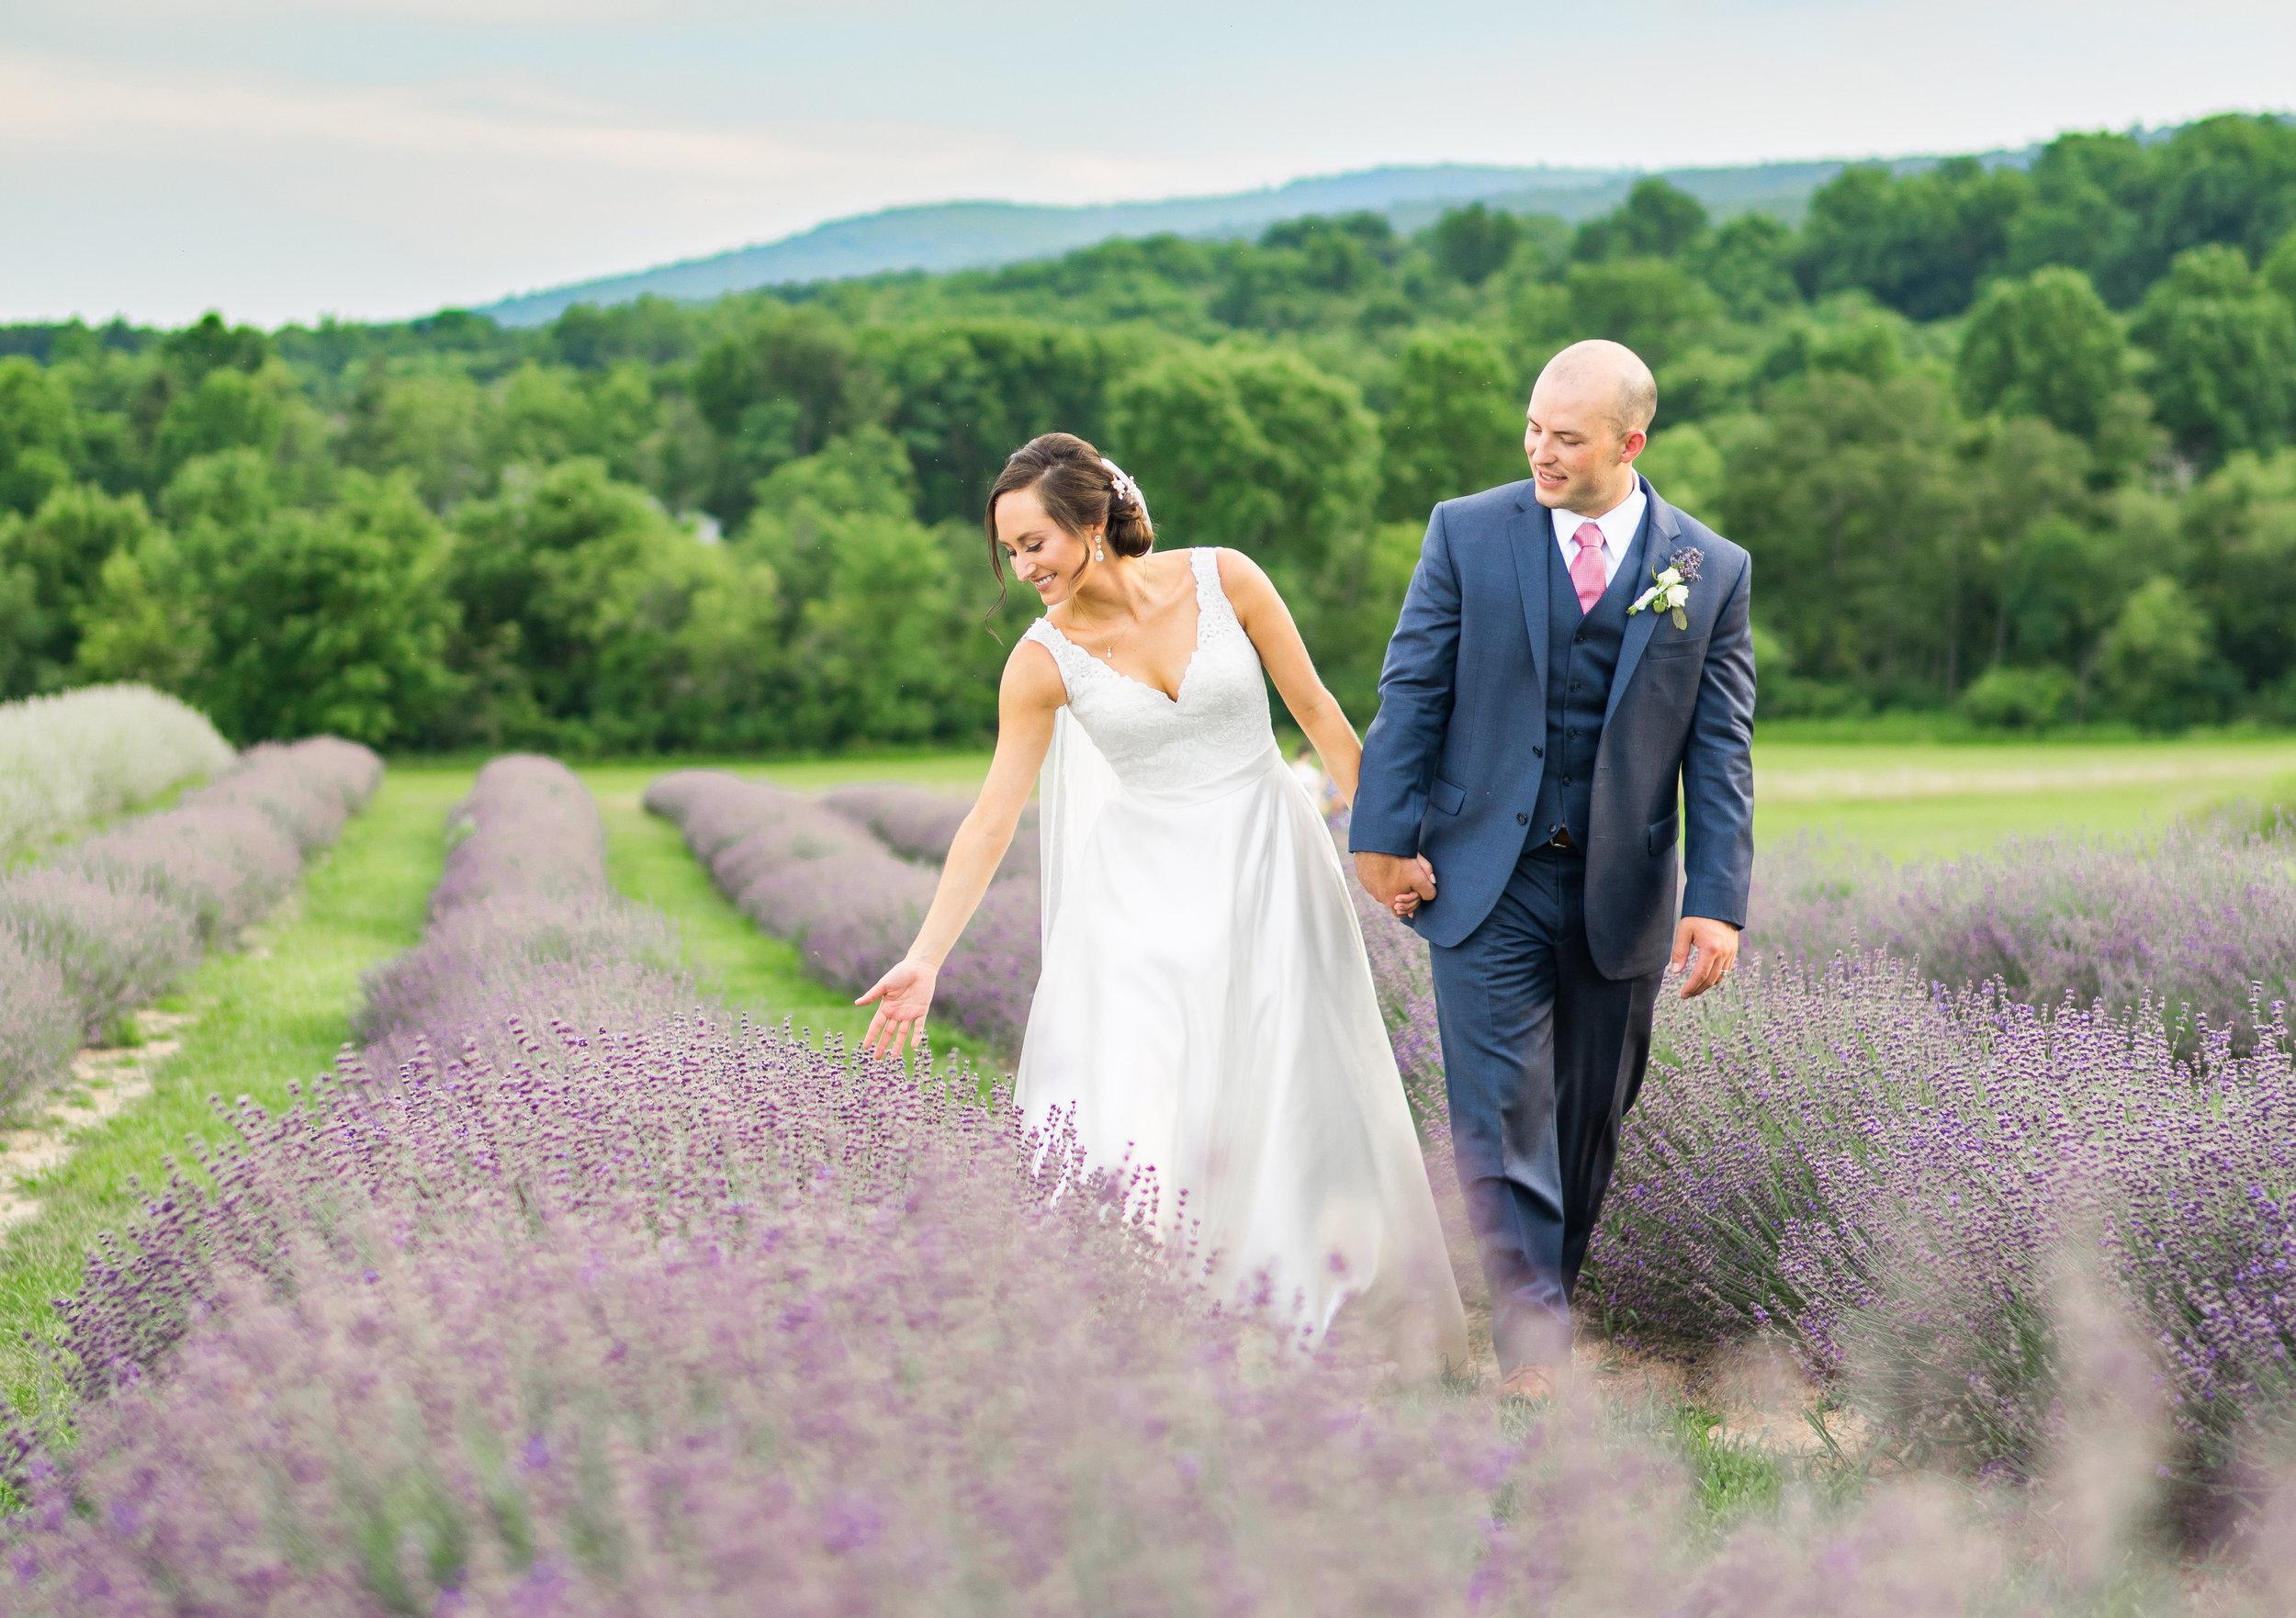 Springfield Manor Winery and Distillery wedding photos lavender